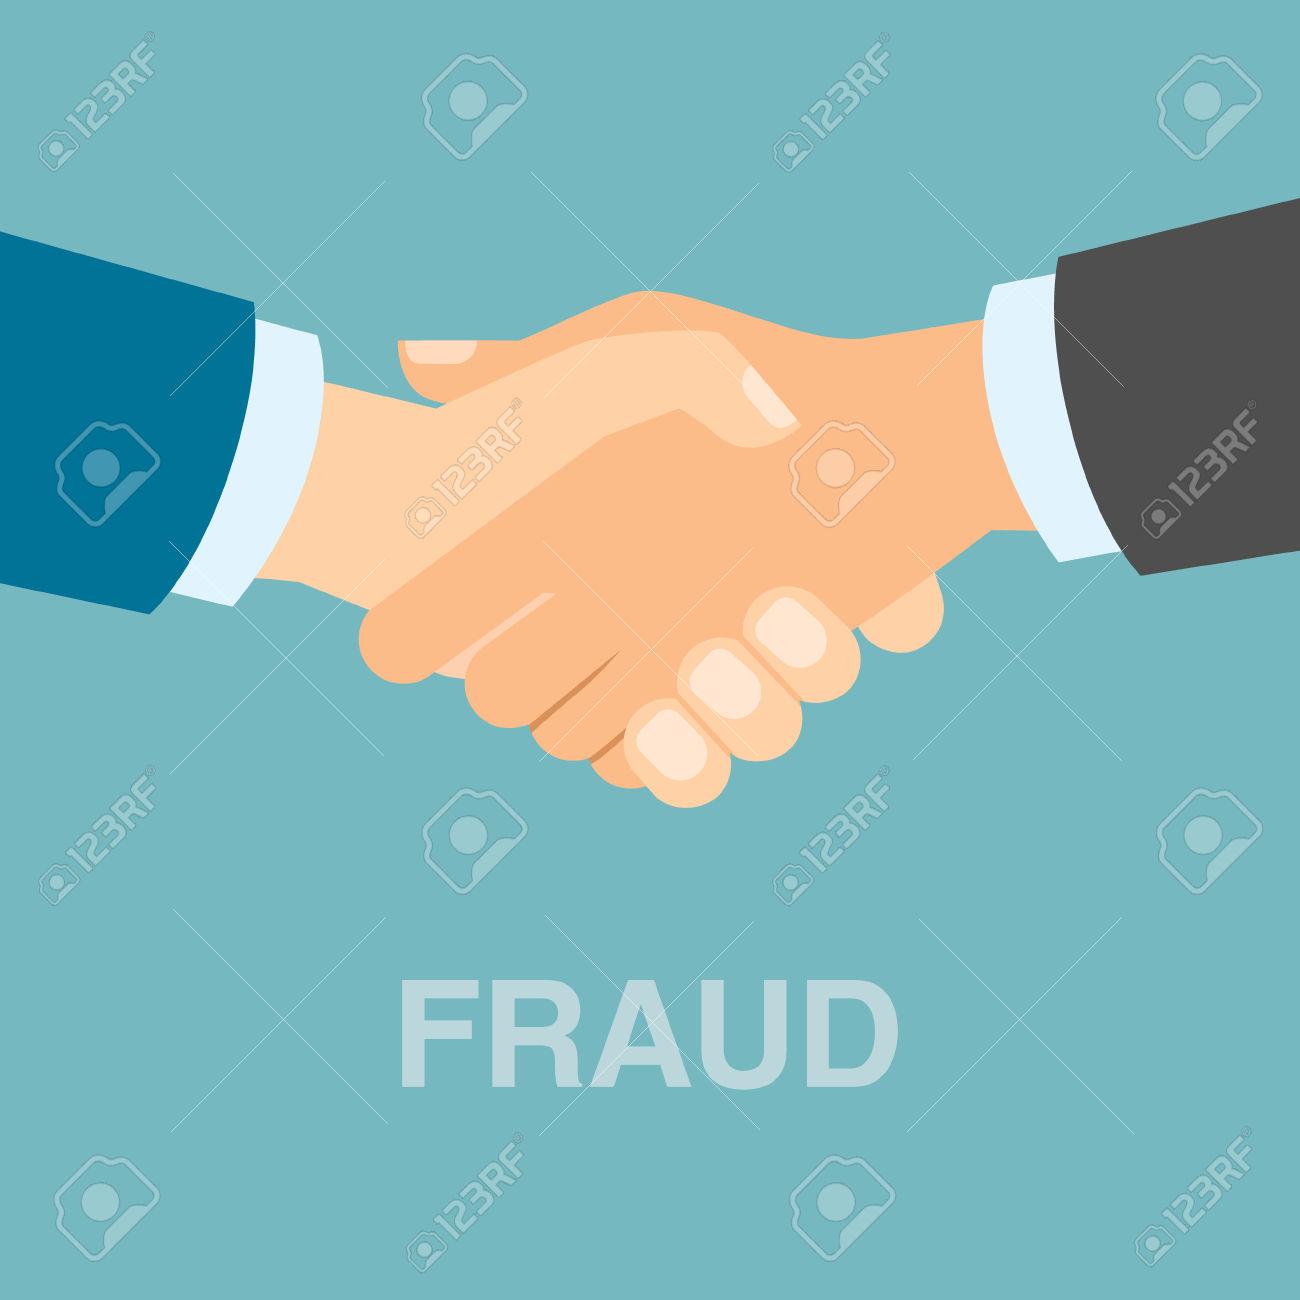 Bad fraud handshake.